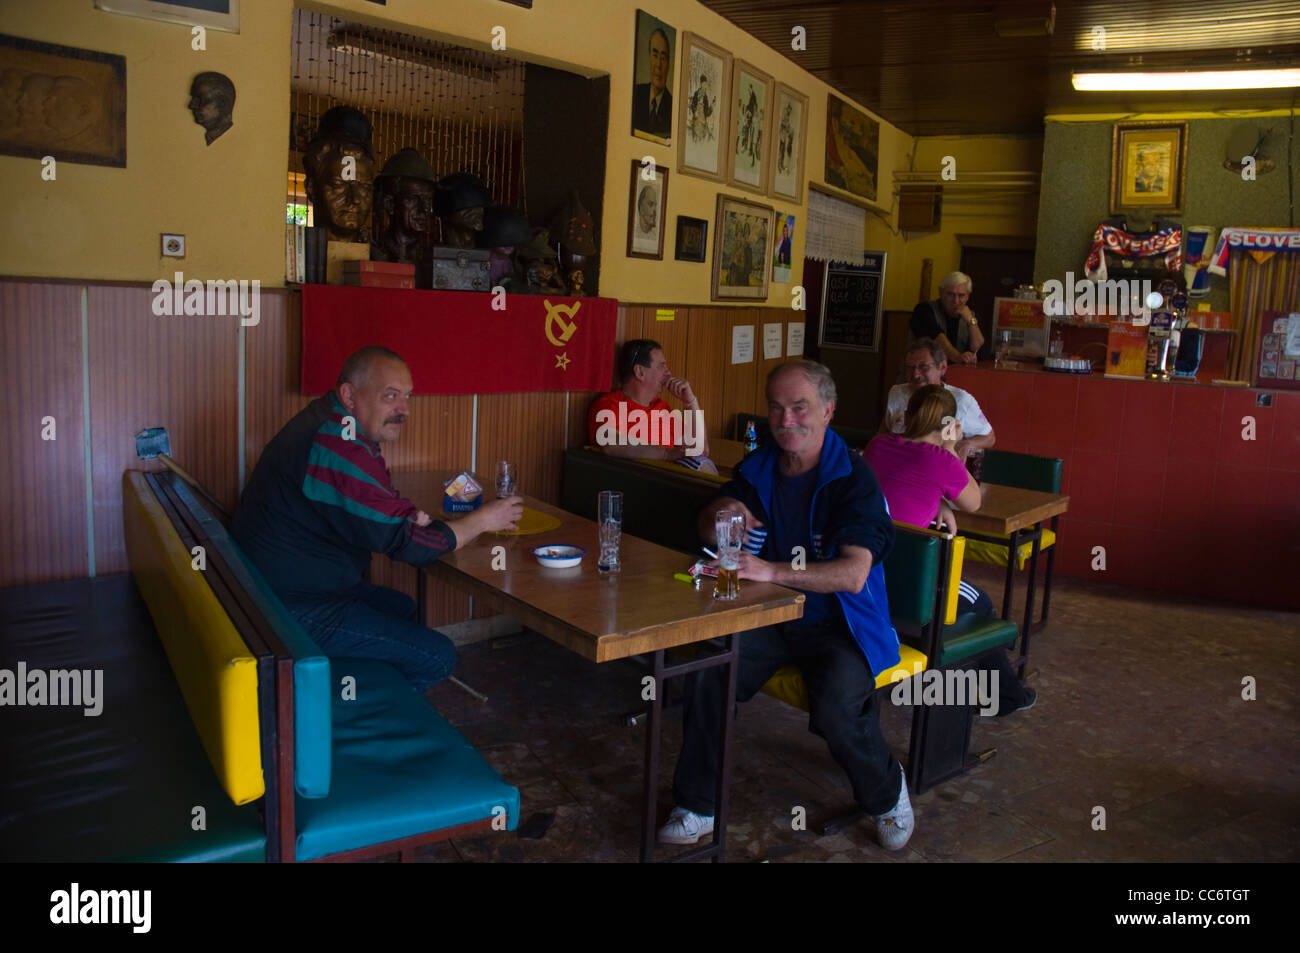 Einheimische in kommunistischen Thema Bar entlang Sasinkova Straße zentrale ?ilina Slowakei Europa Stockbild